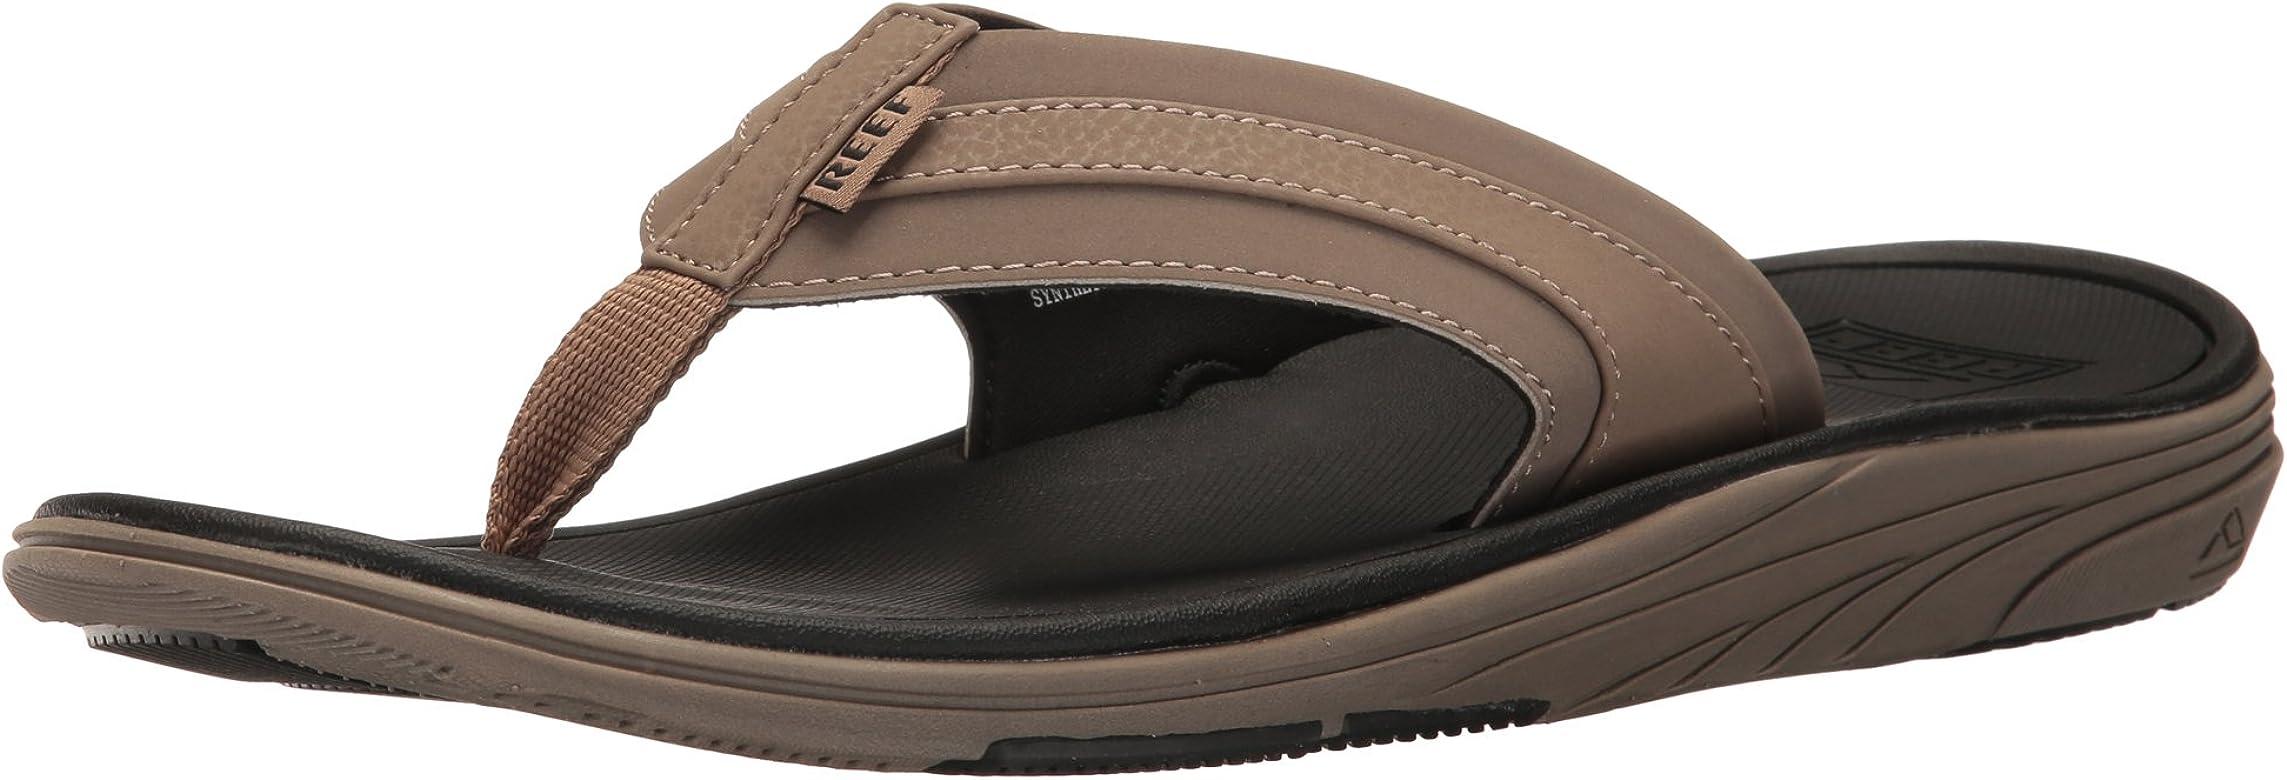 0f1bcdf166ea Amazon.com  Reef Men s Phoenix Sandal